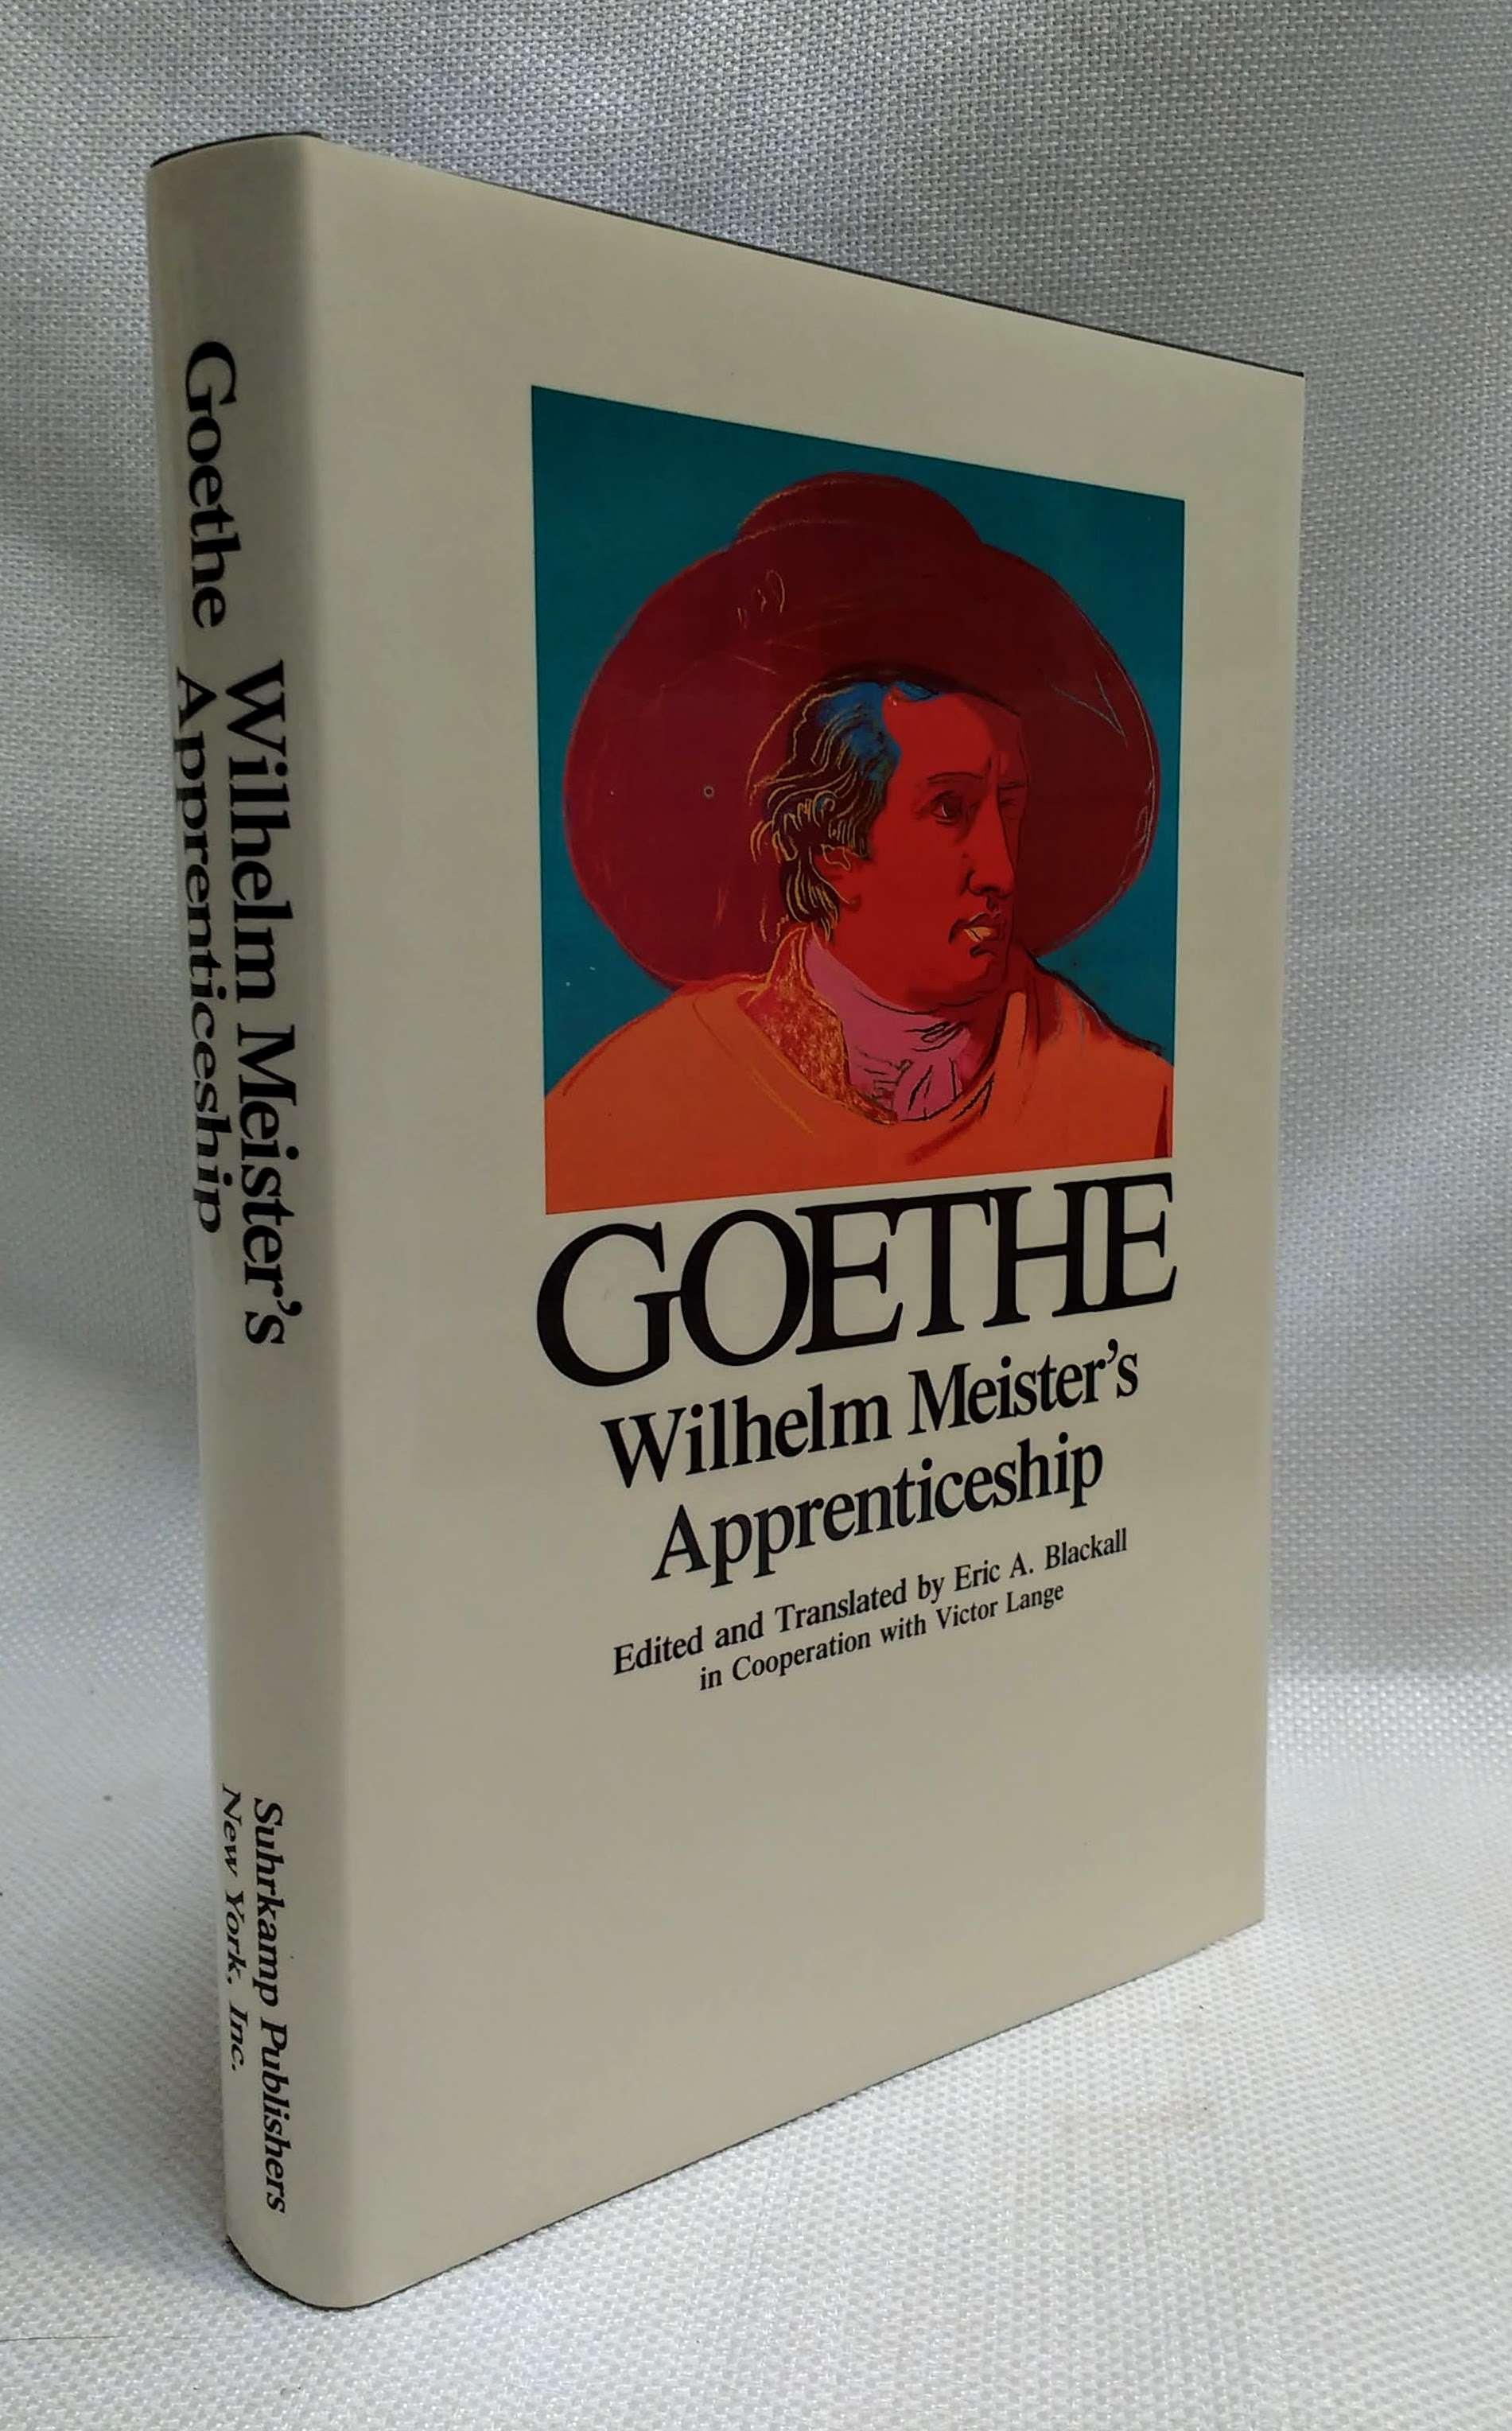 Wilhelm Meister's Apprenticeship (Goethe: The Collected Works, Vol. 9), von Goethe, Johann Wolfgang; Blackall, Eric A. [Editor]